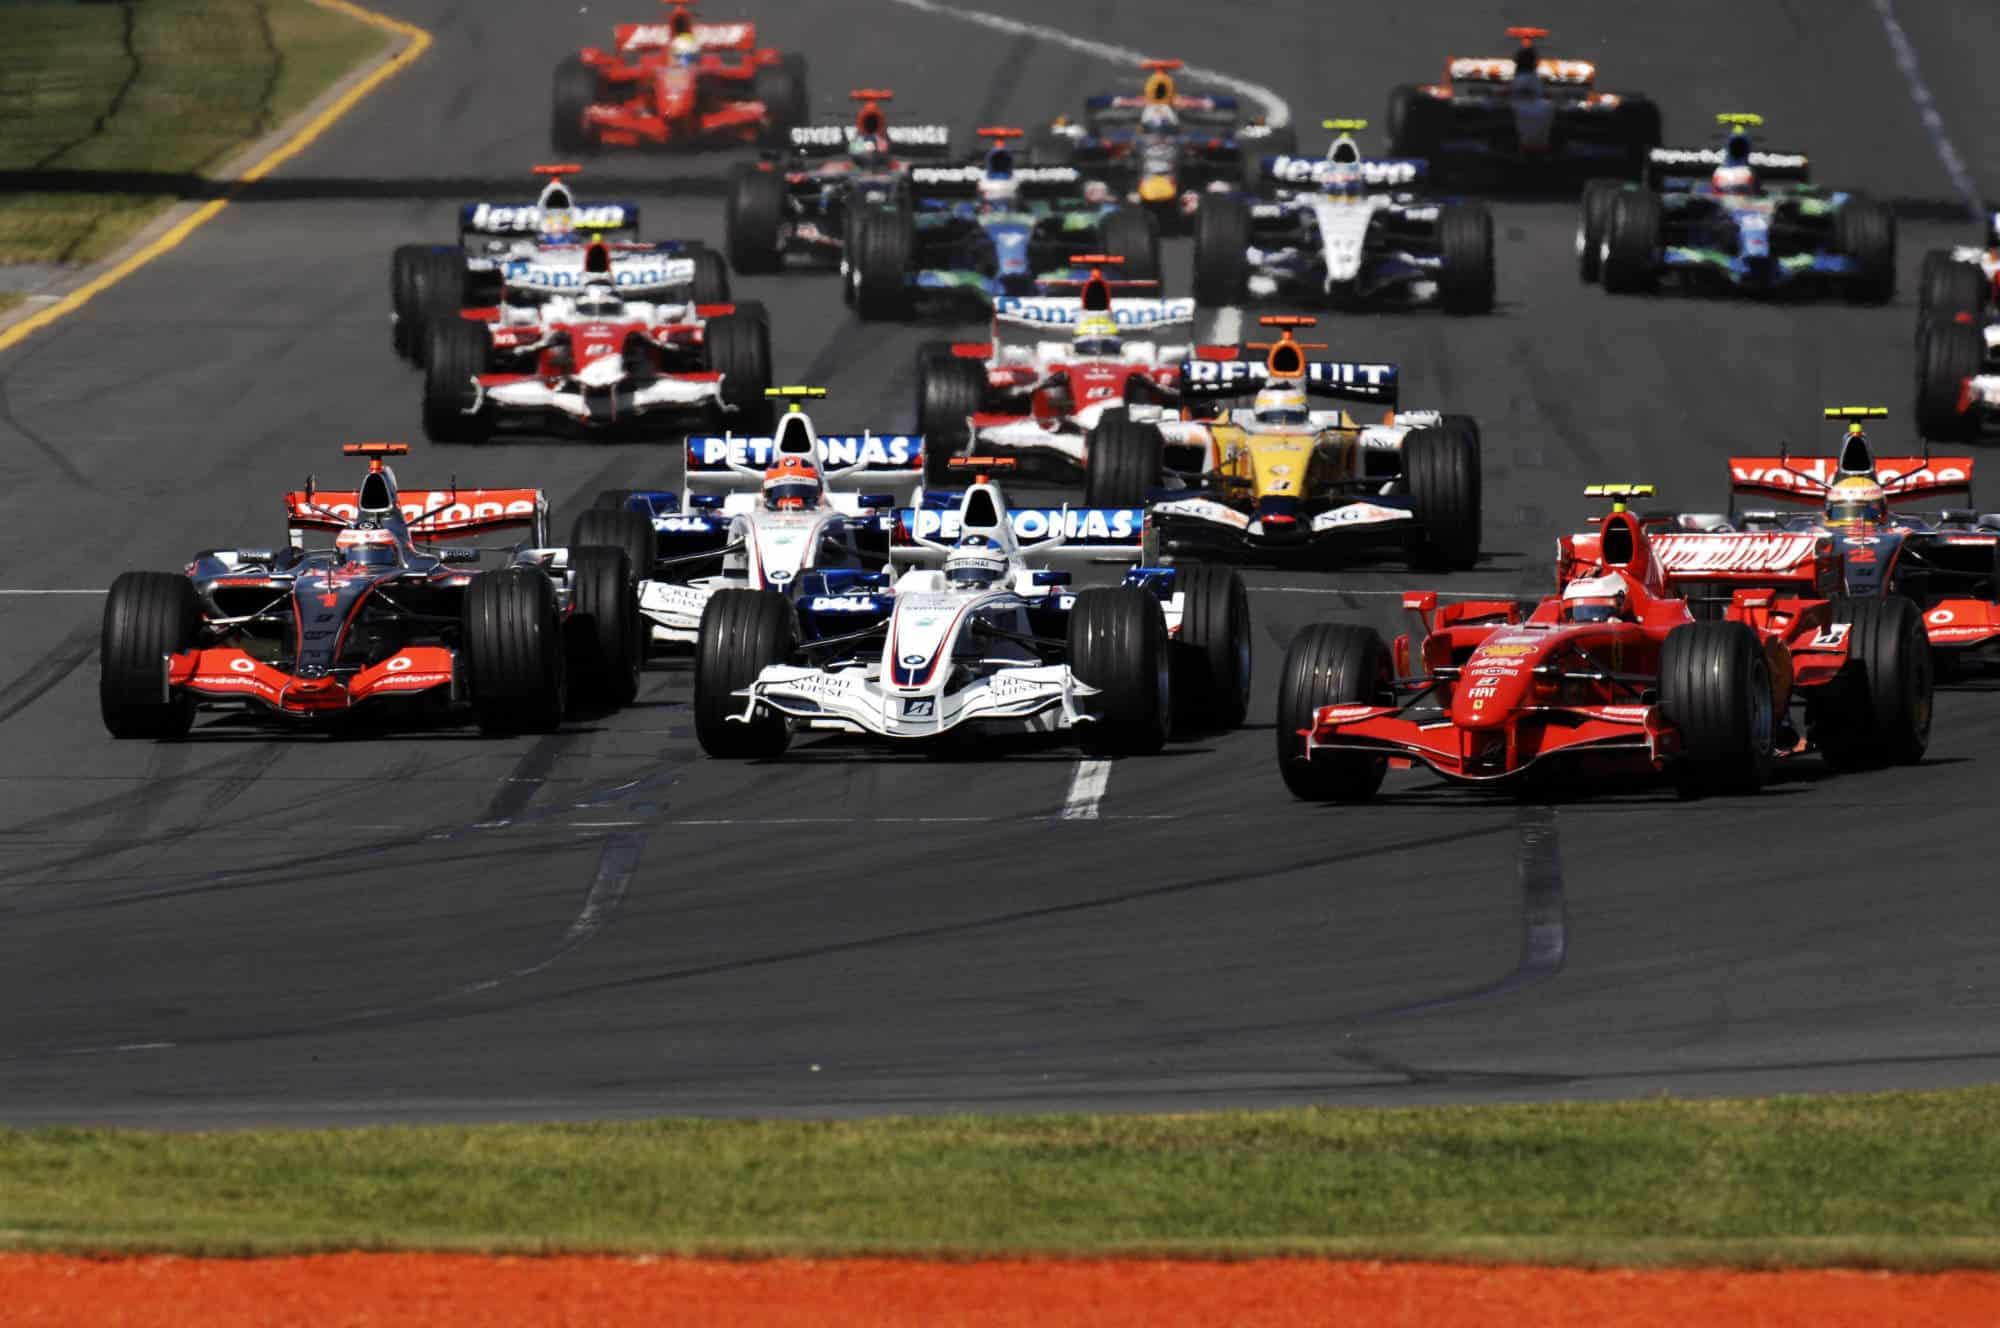 2007 Australian GP start zoom Photo Ferrari